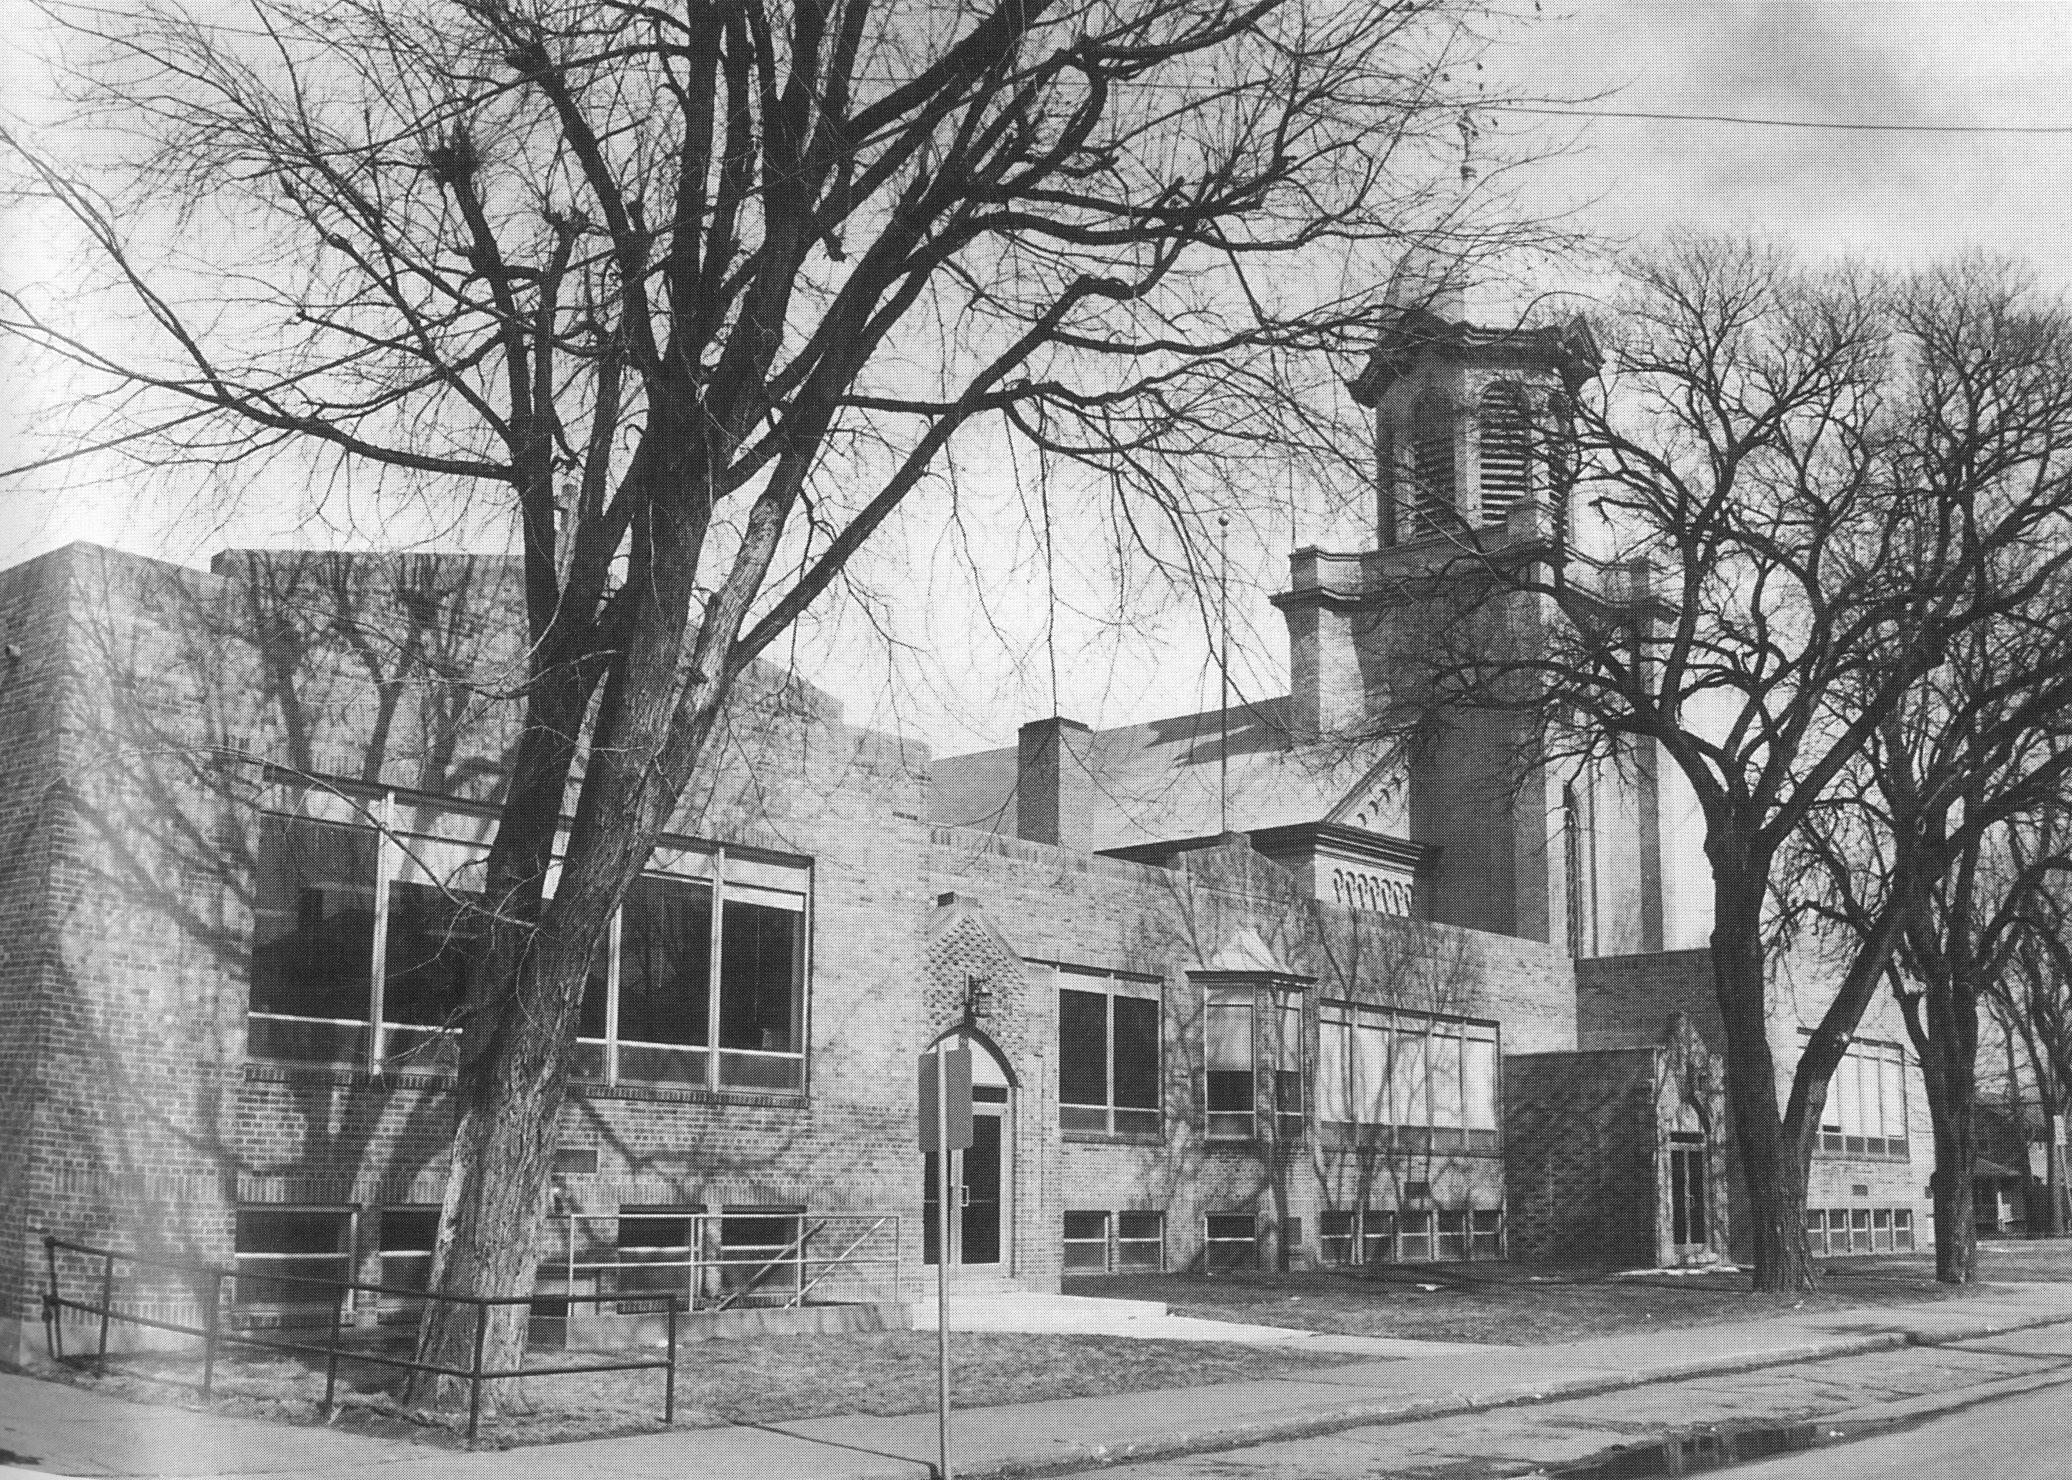 St. Patrick's School, 1938.